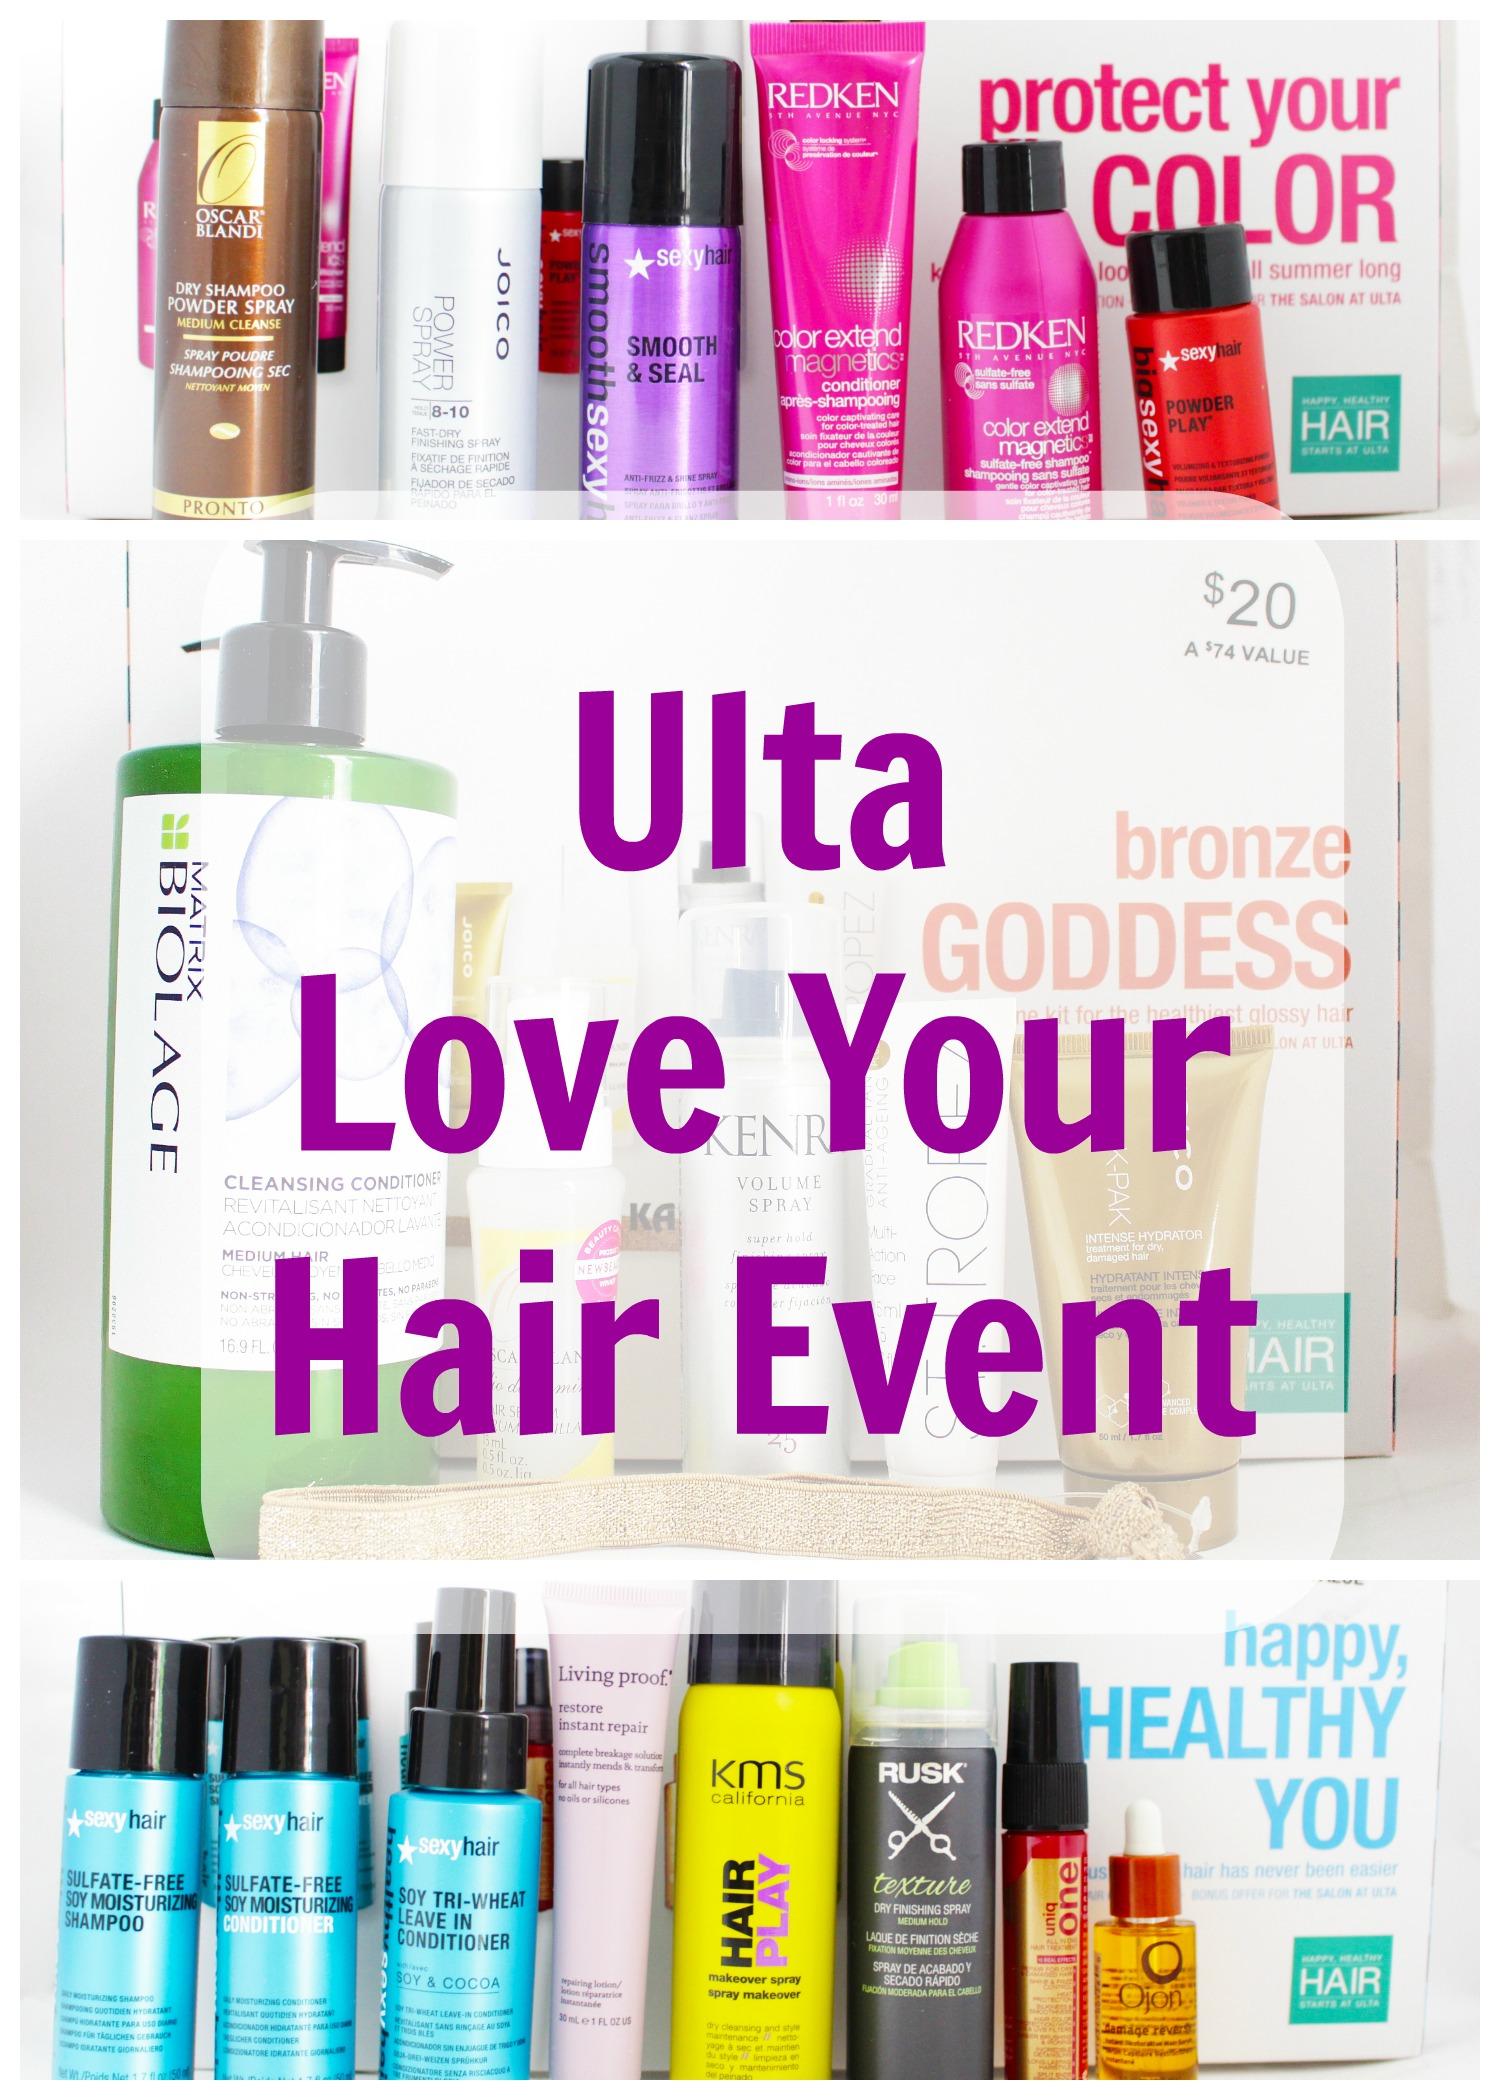 Ulta Love Your Hair Event